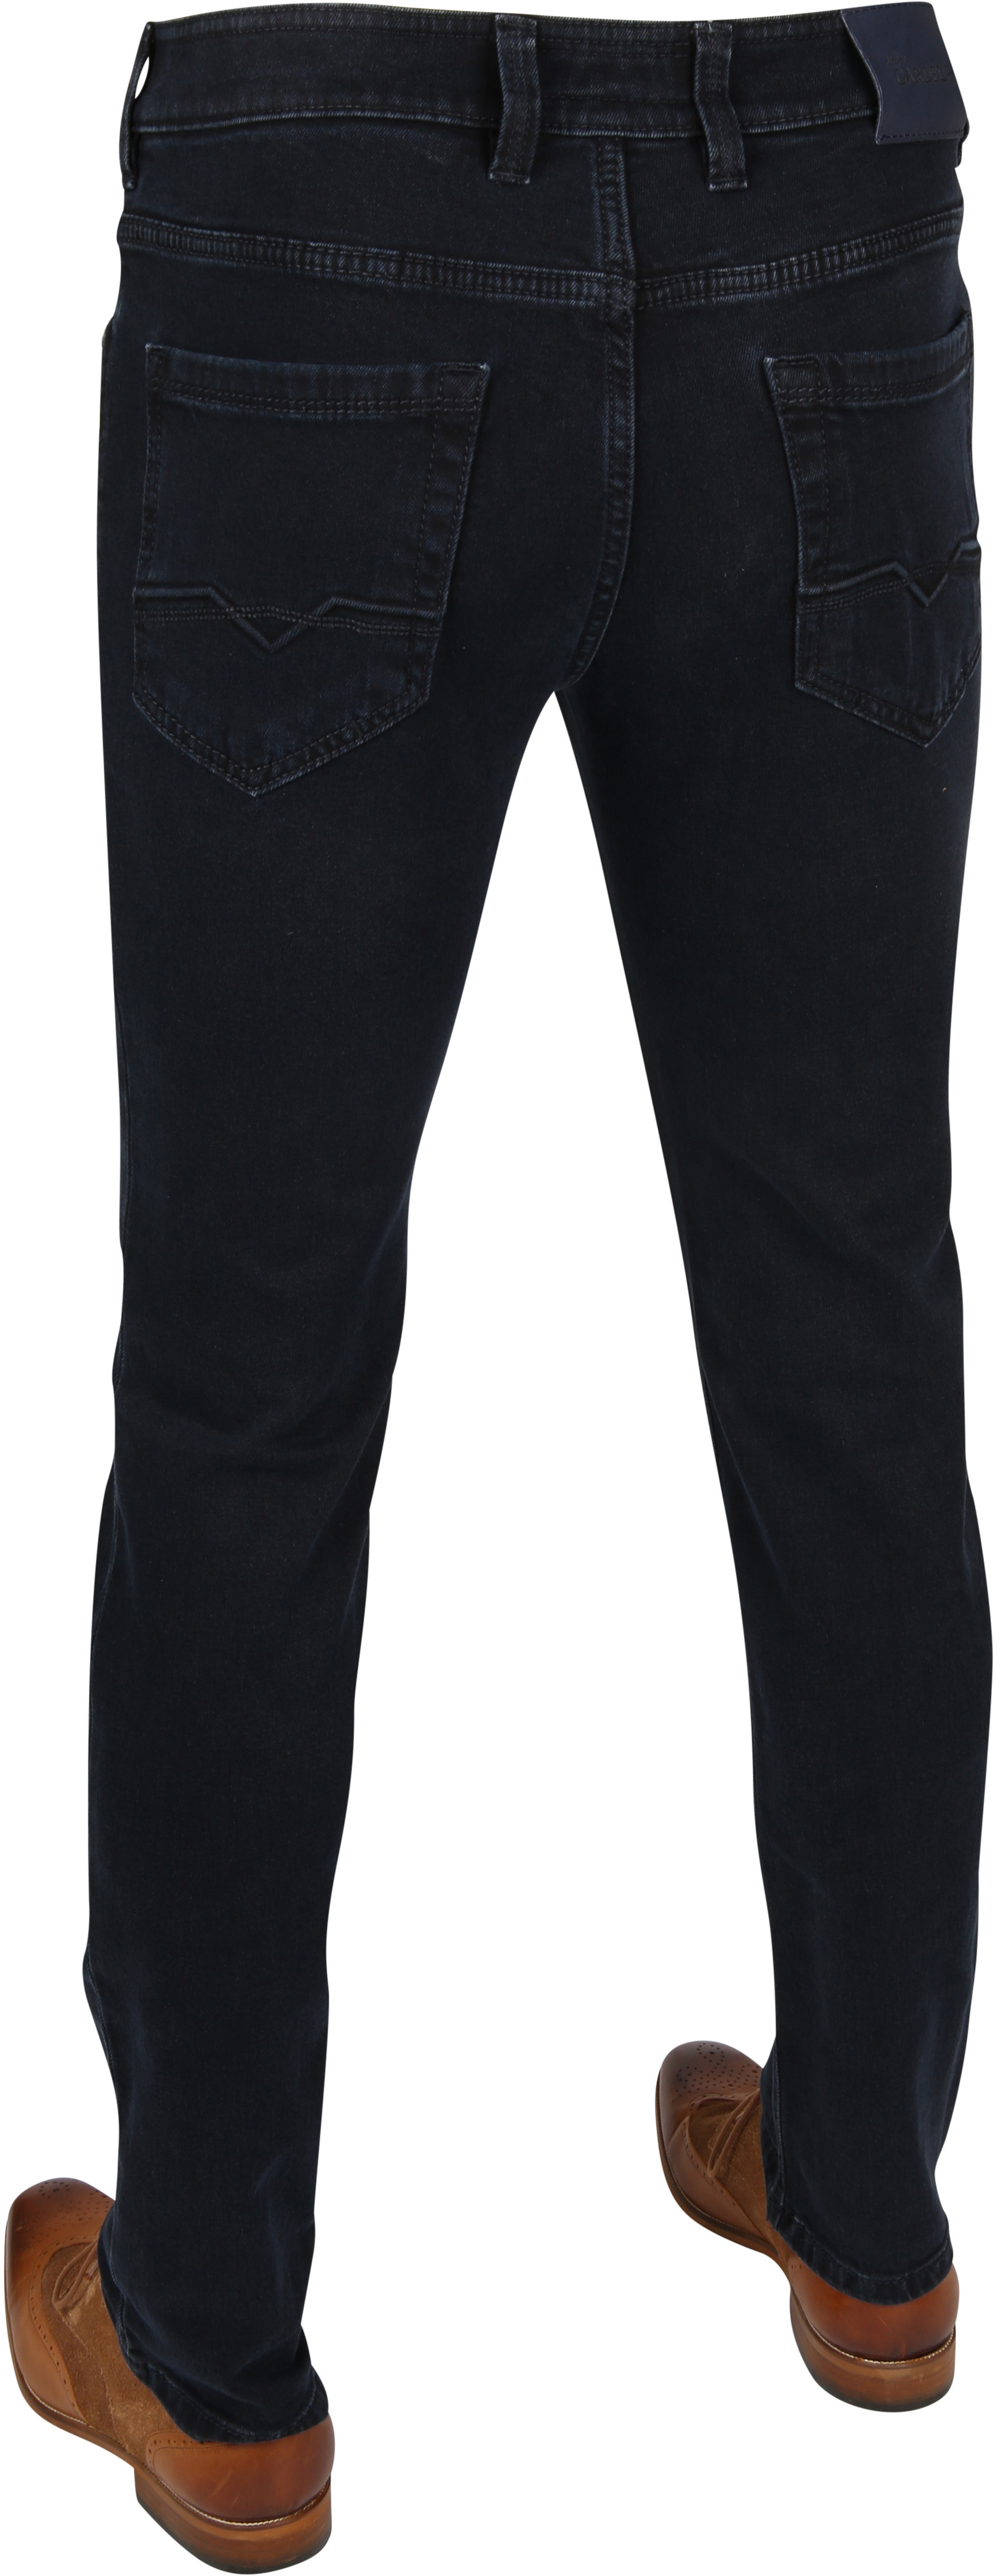 Gardeur Batu Jeans Rinse Navy photo 2